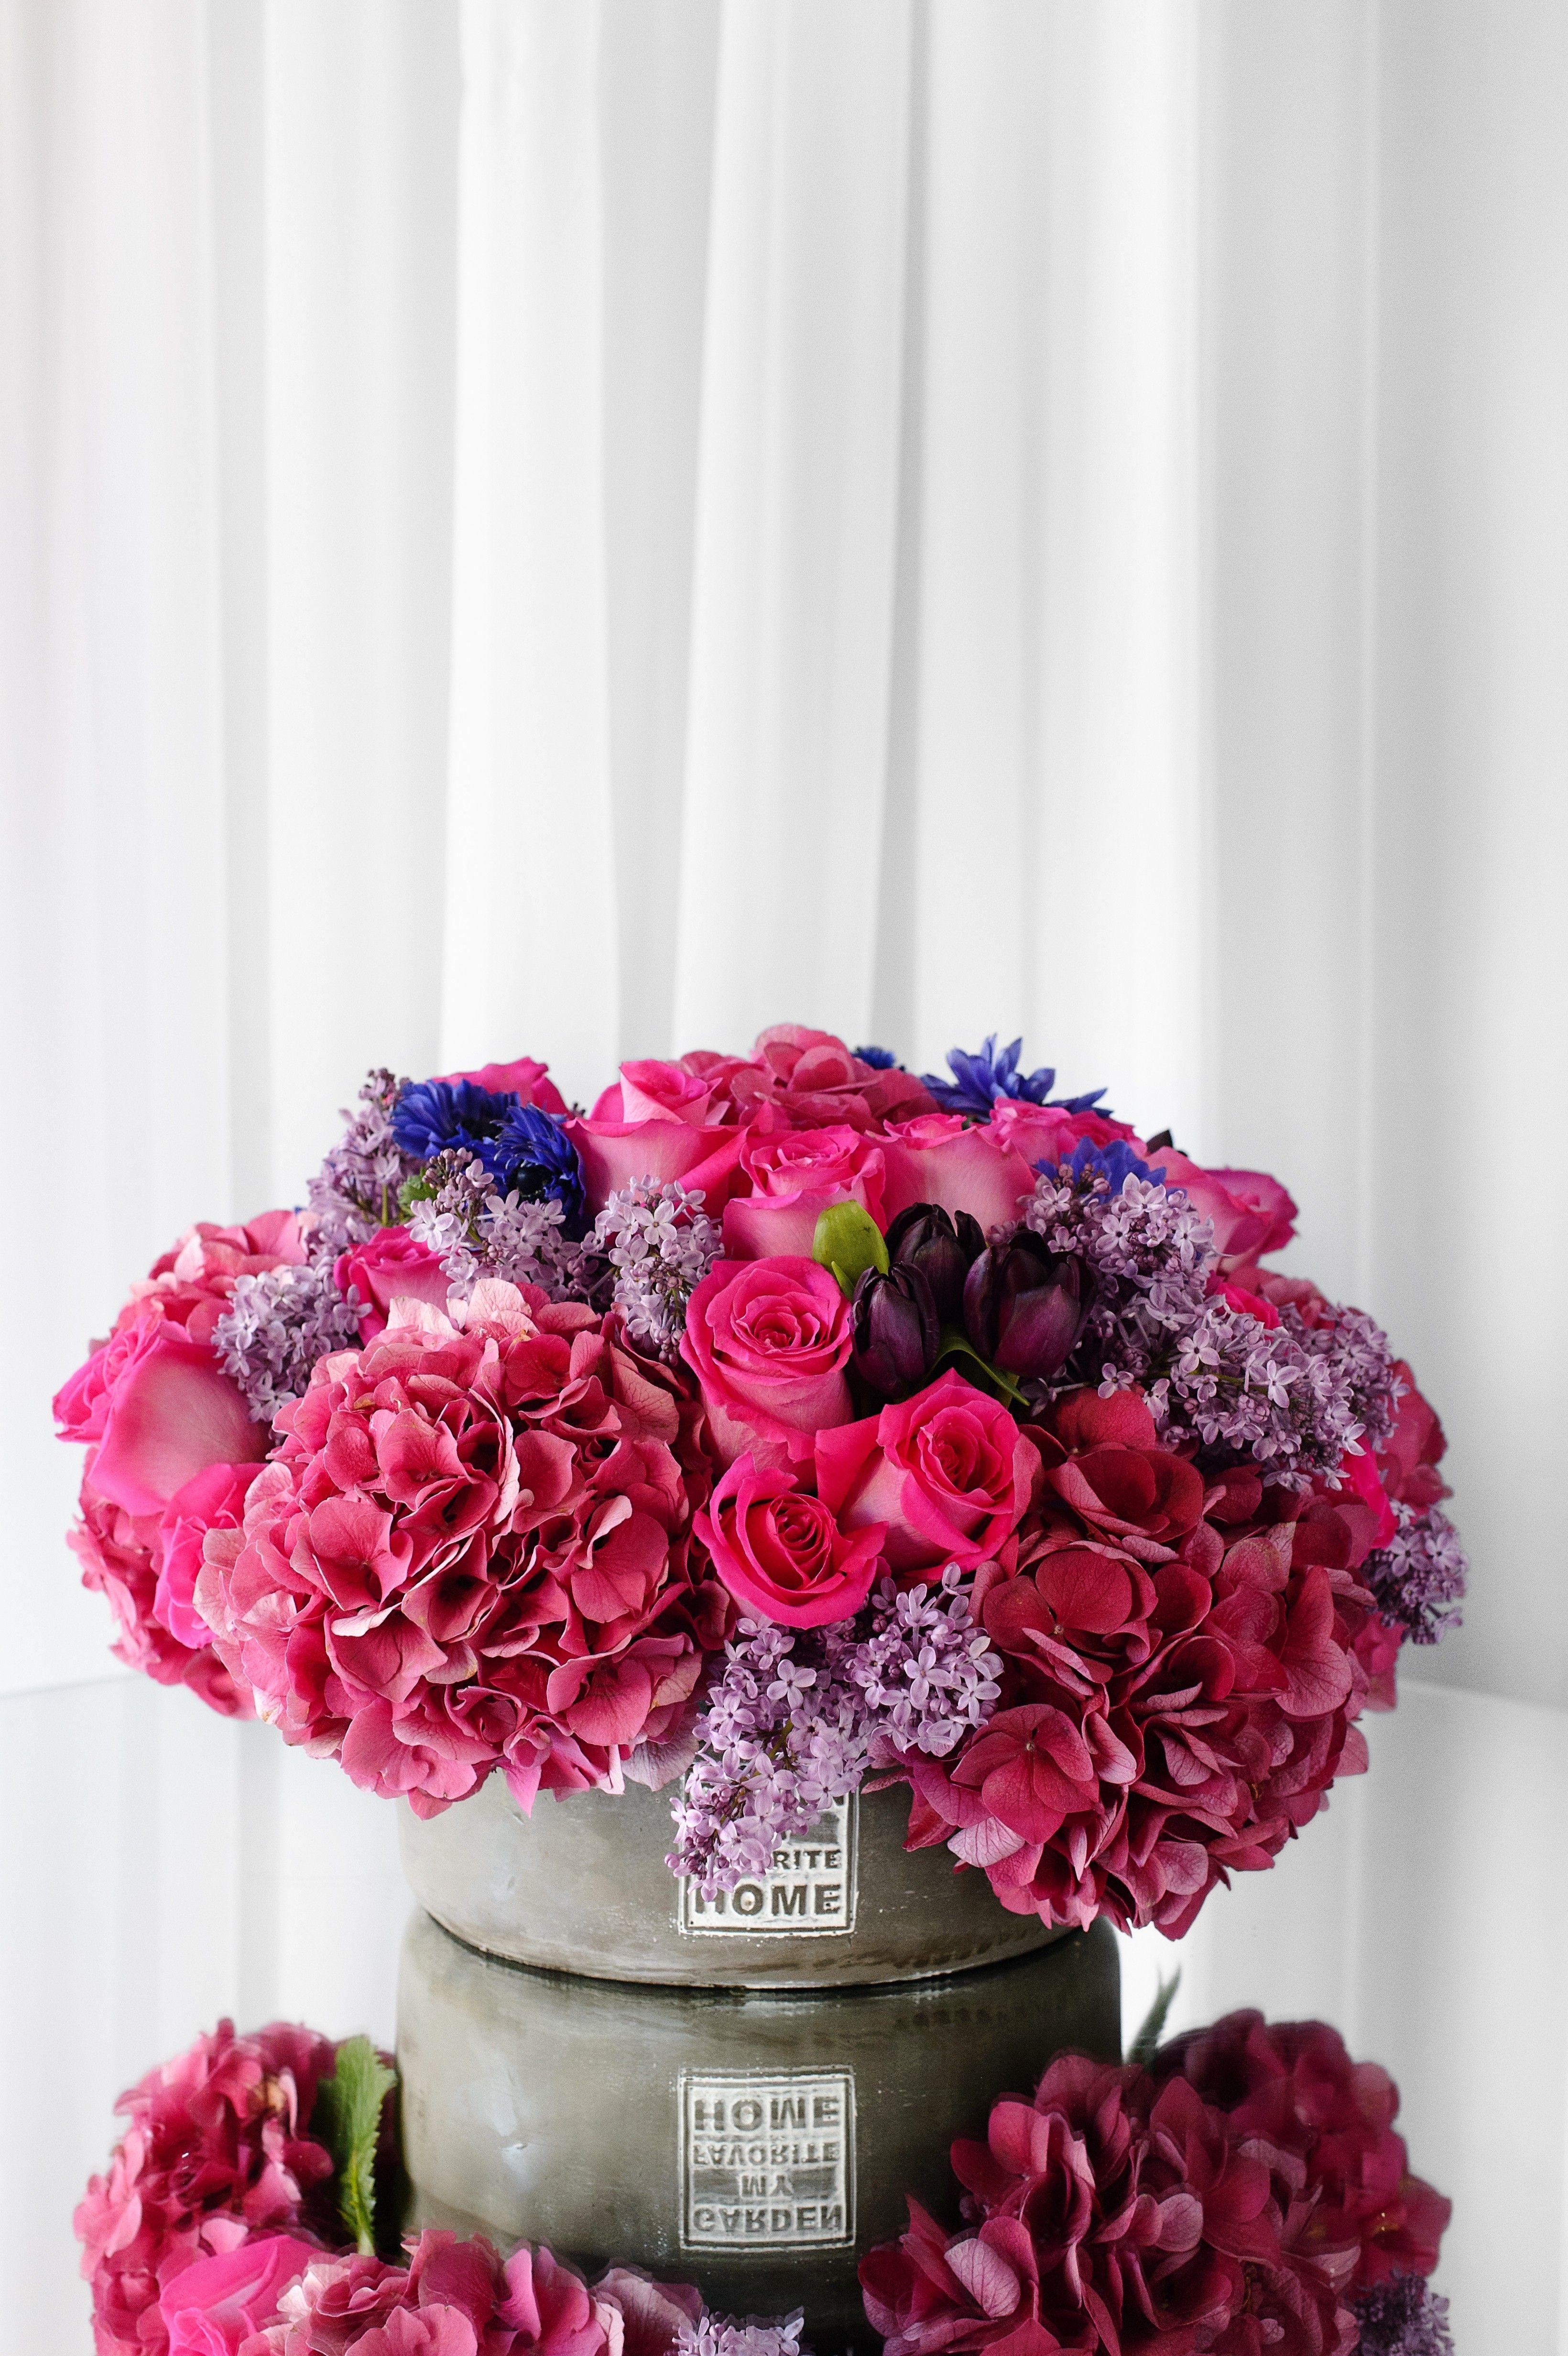 The Hidden Garden Valentines Flowers Flower Delivery Hidden Garden